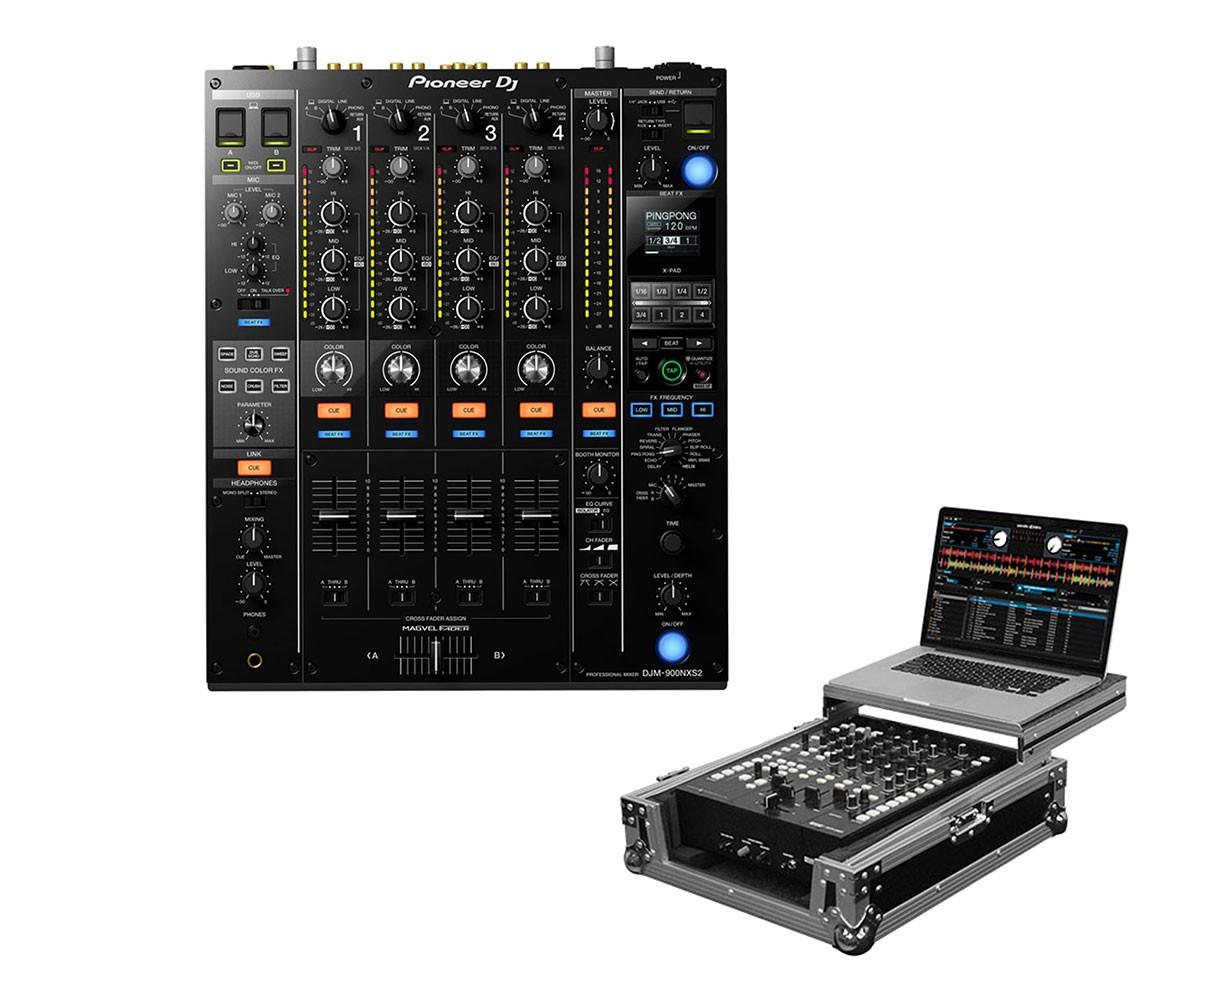 Pioneer DJM-900 Nexus + Glide Style Case